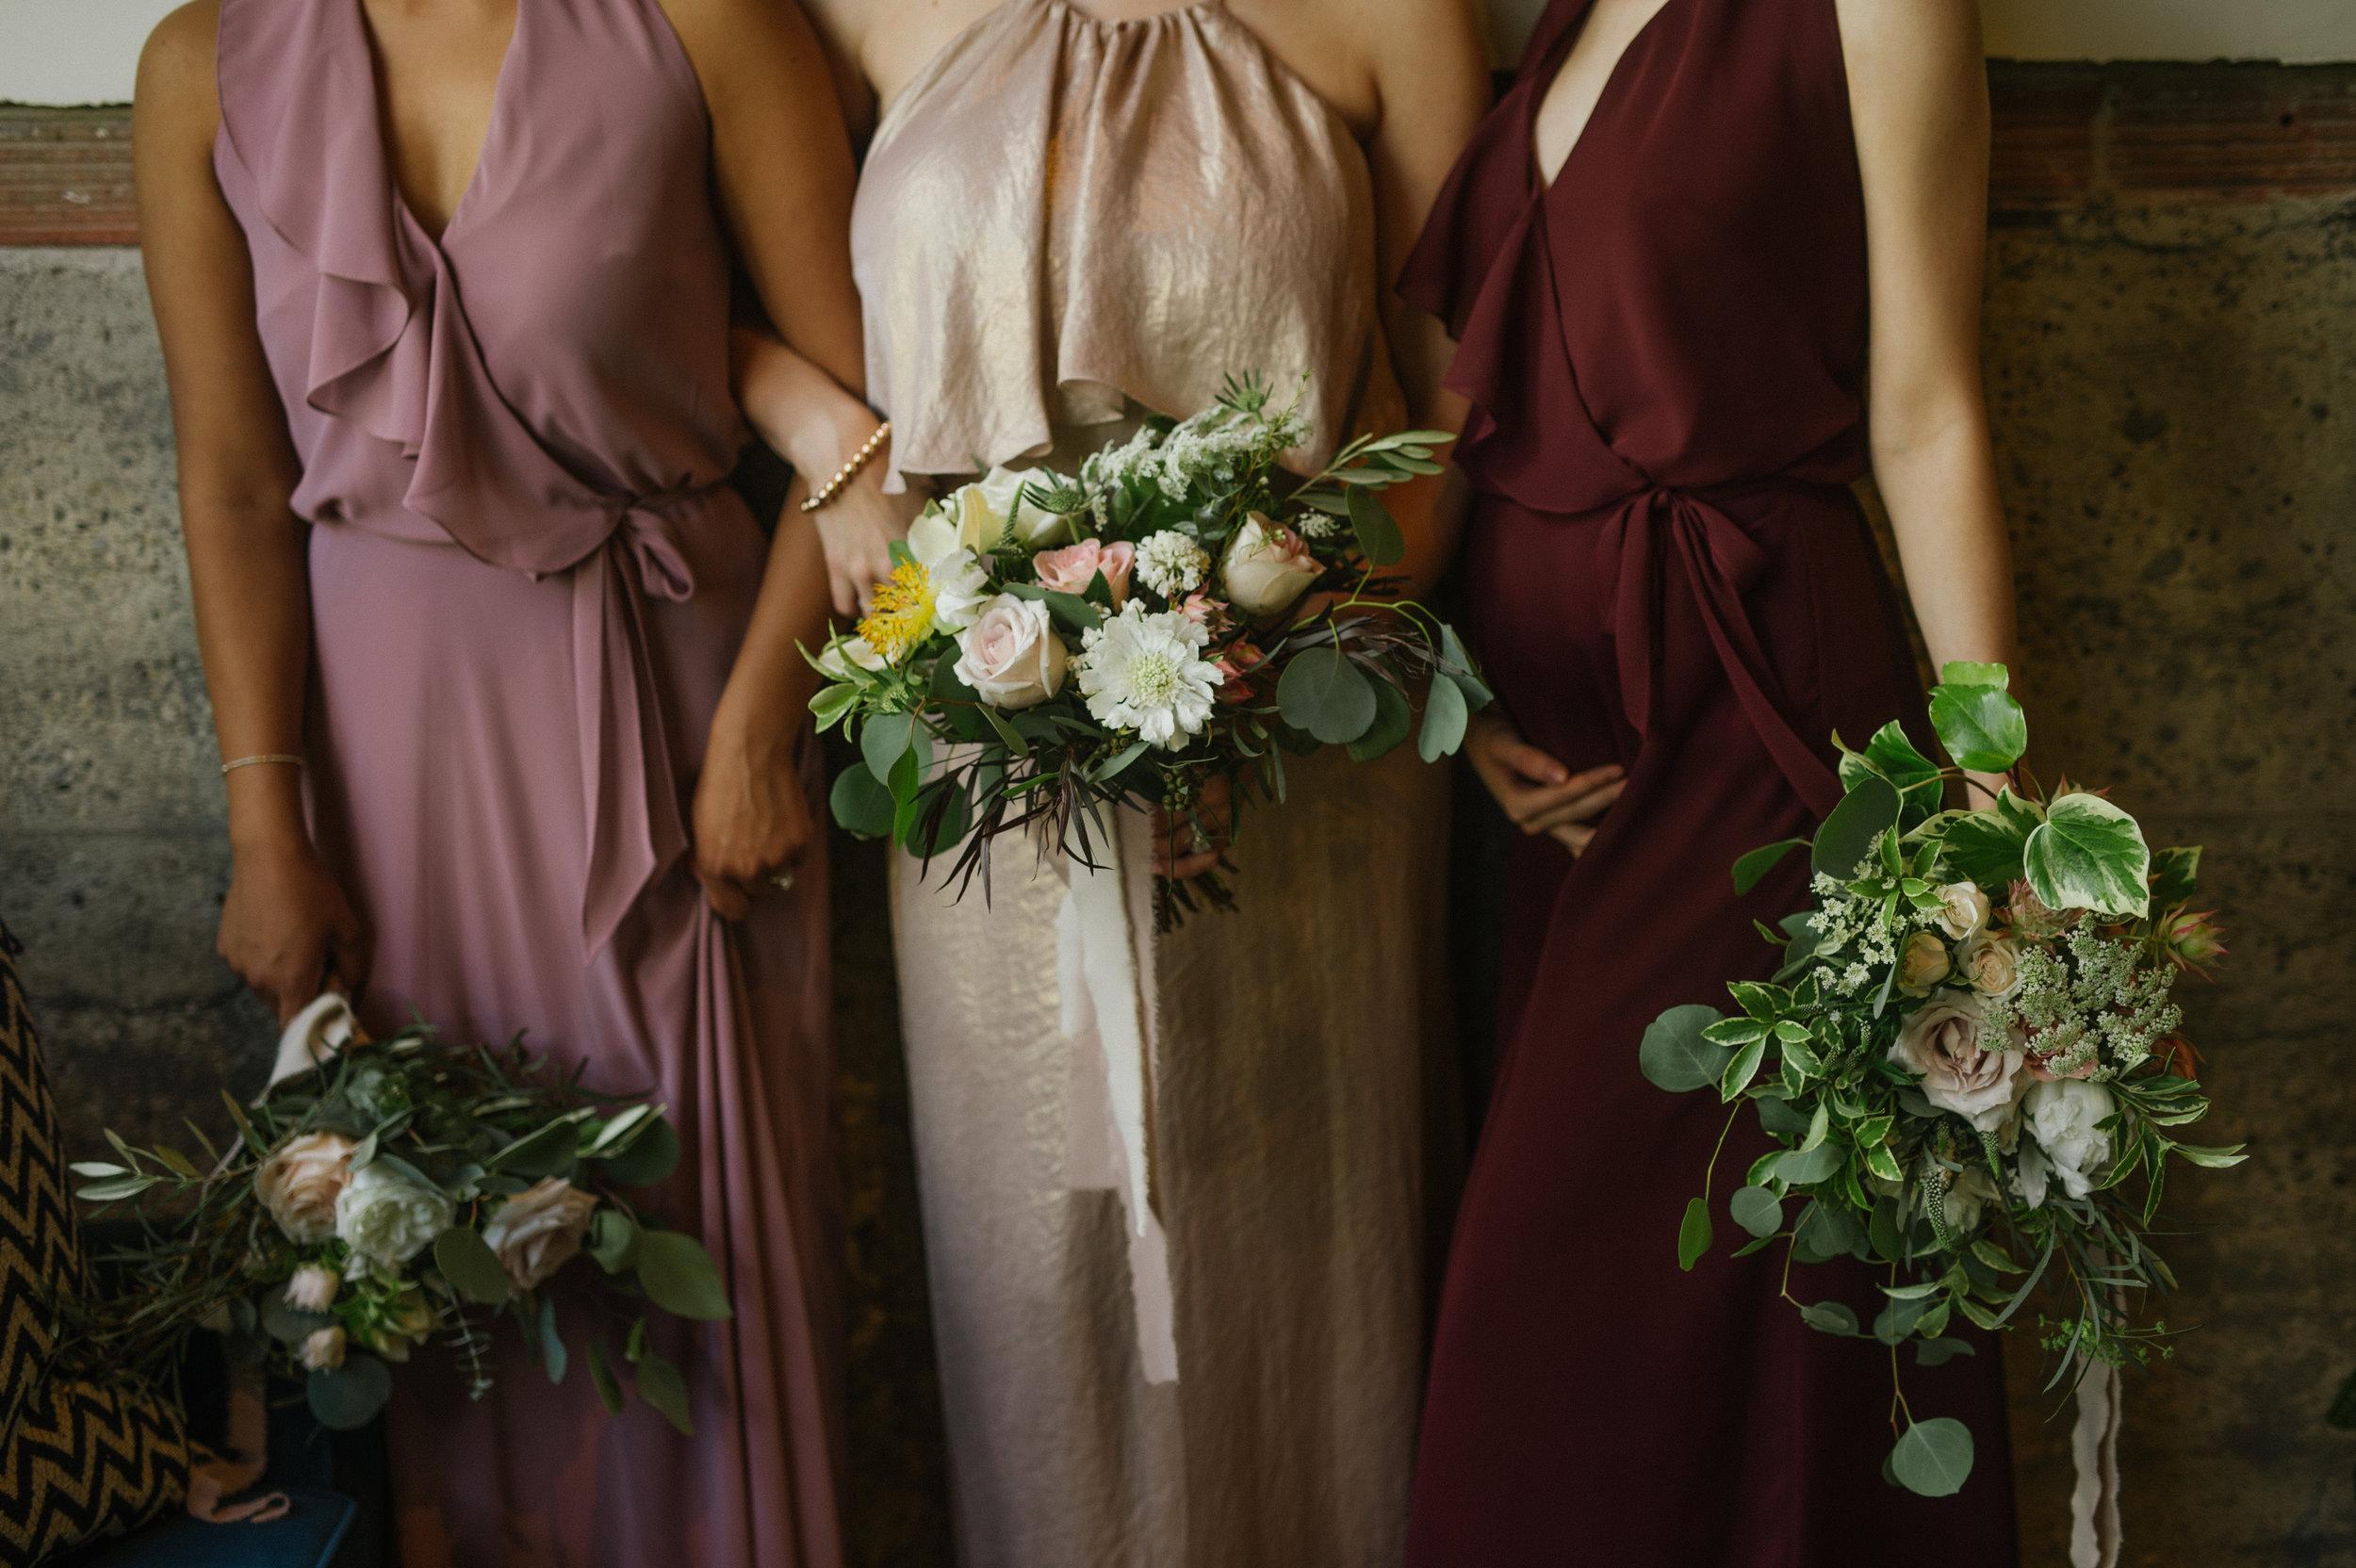 Calgary_Wedding_Photography_Bridgette_Bar_Bridesmaids_Shoot_2018_HR081.jpg